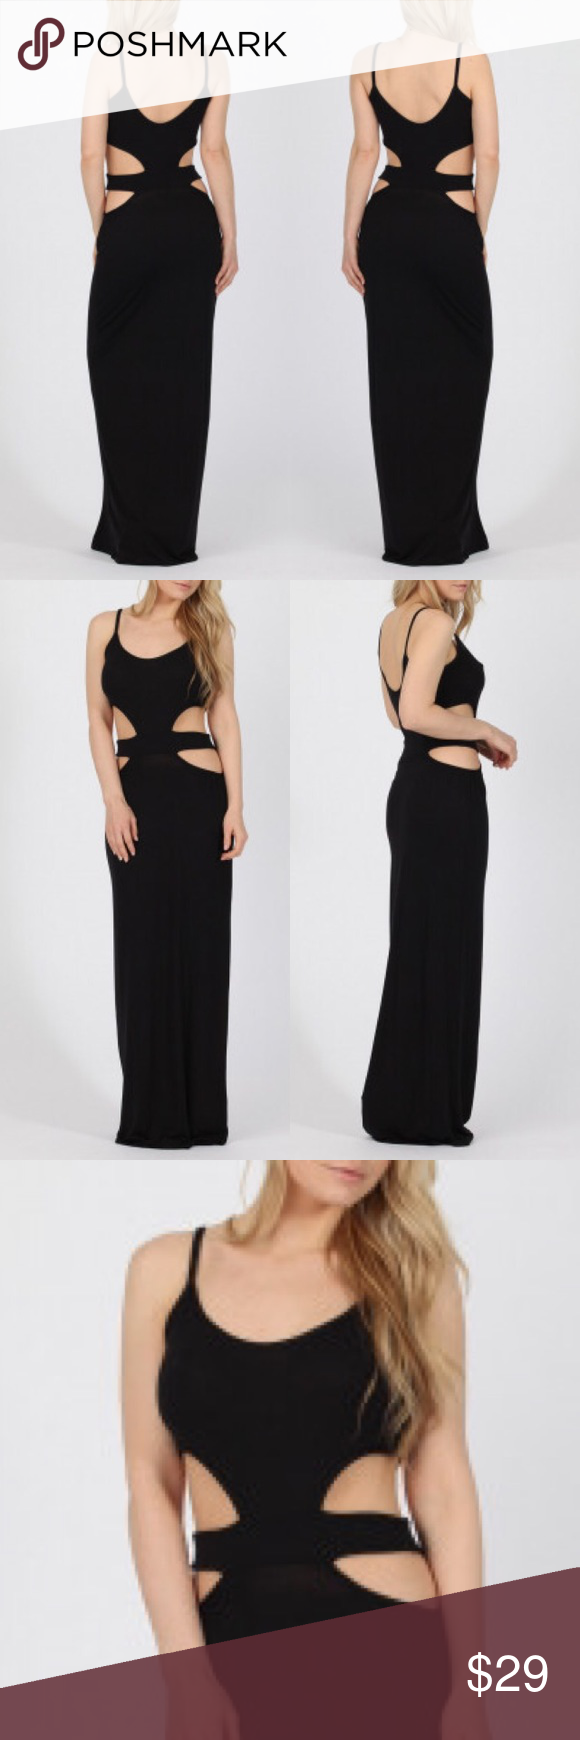 One Left Black Waist Cutout Bodycon Maxi Dress Fashion Women Clothing Boutique Clothing Boutique Ideas [ 1740 x 580 Pixel ]